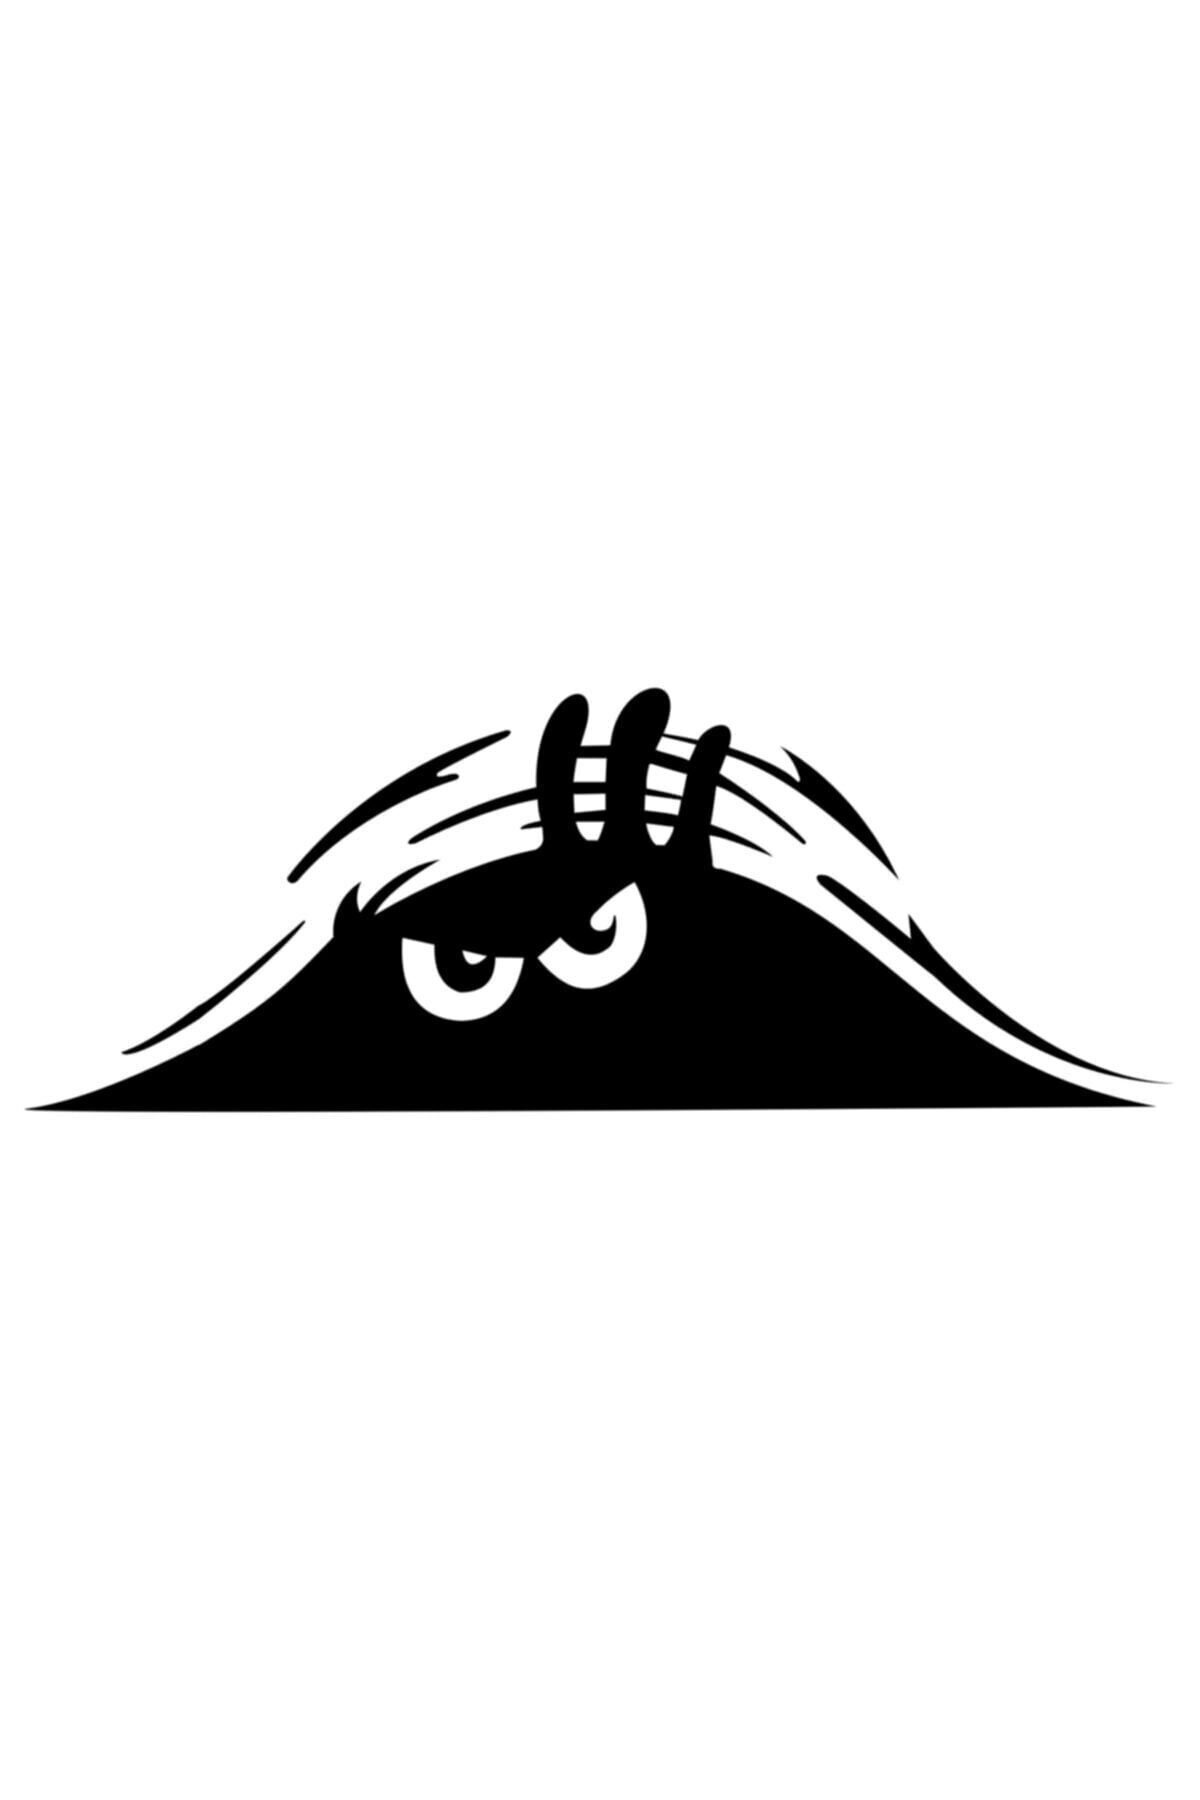 Quart Aksesuar Siyah 30 cm Bagajdan Bakan Adam Oto Sticker Araba Sticker 1